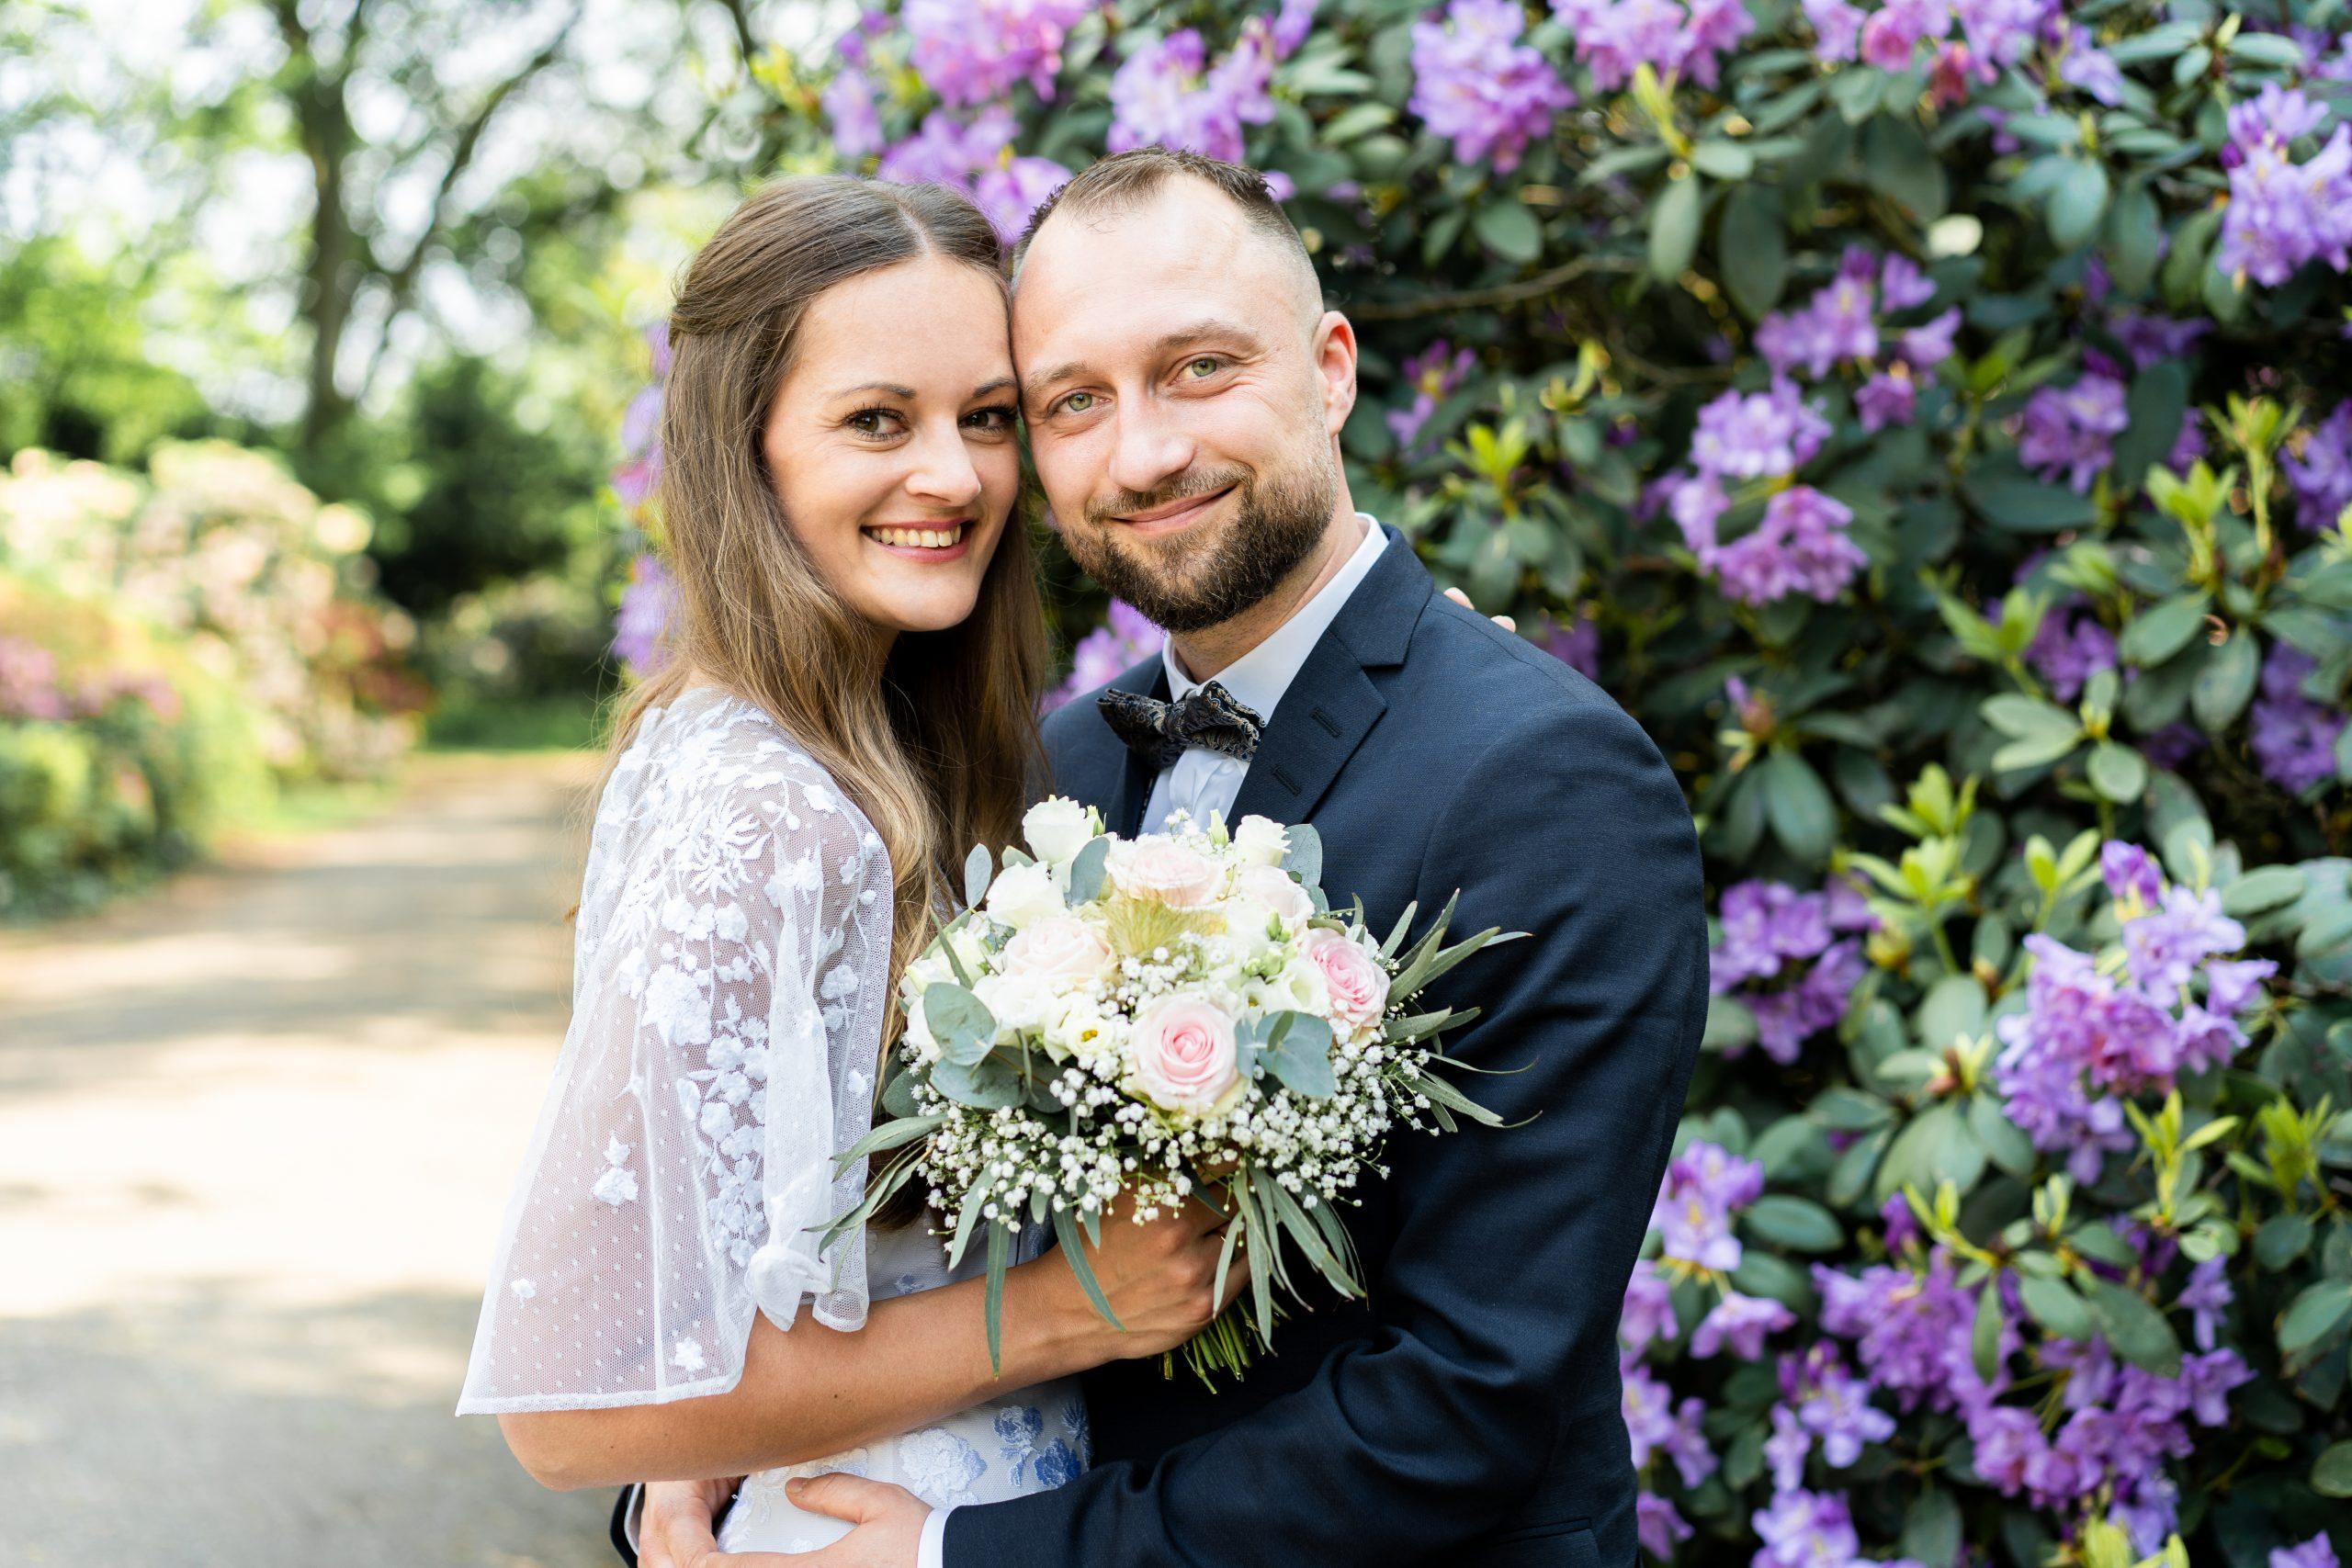 Rhododendron Blumen Brautpaar Shooting Hochzeitsshooting Outdoorshooting